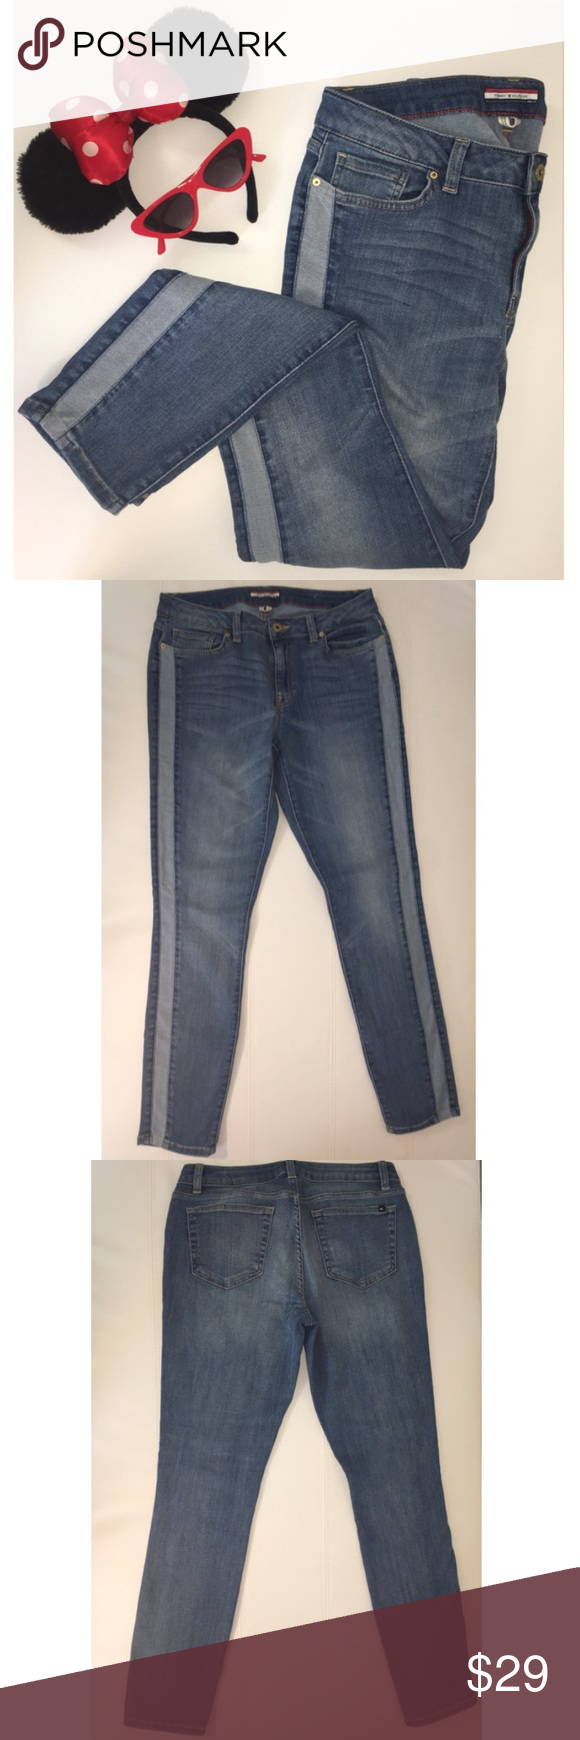 e309918e Tommy Hilfiger Side Striped Skinny Jeans Tommy Hilfiger Side Striped Skinny  Jeans size 8. Great condition. Trendy, mini logo on back pocket.